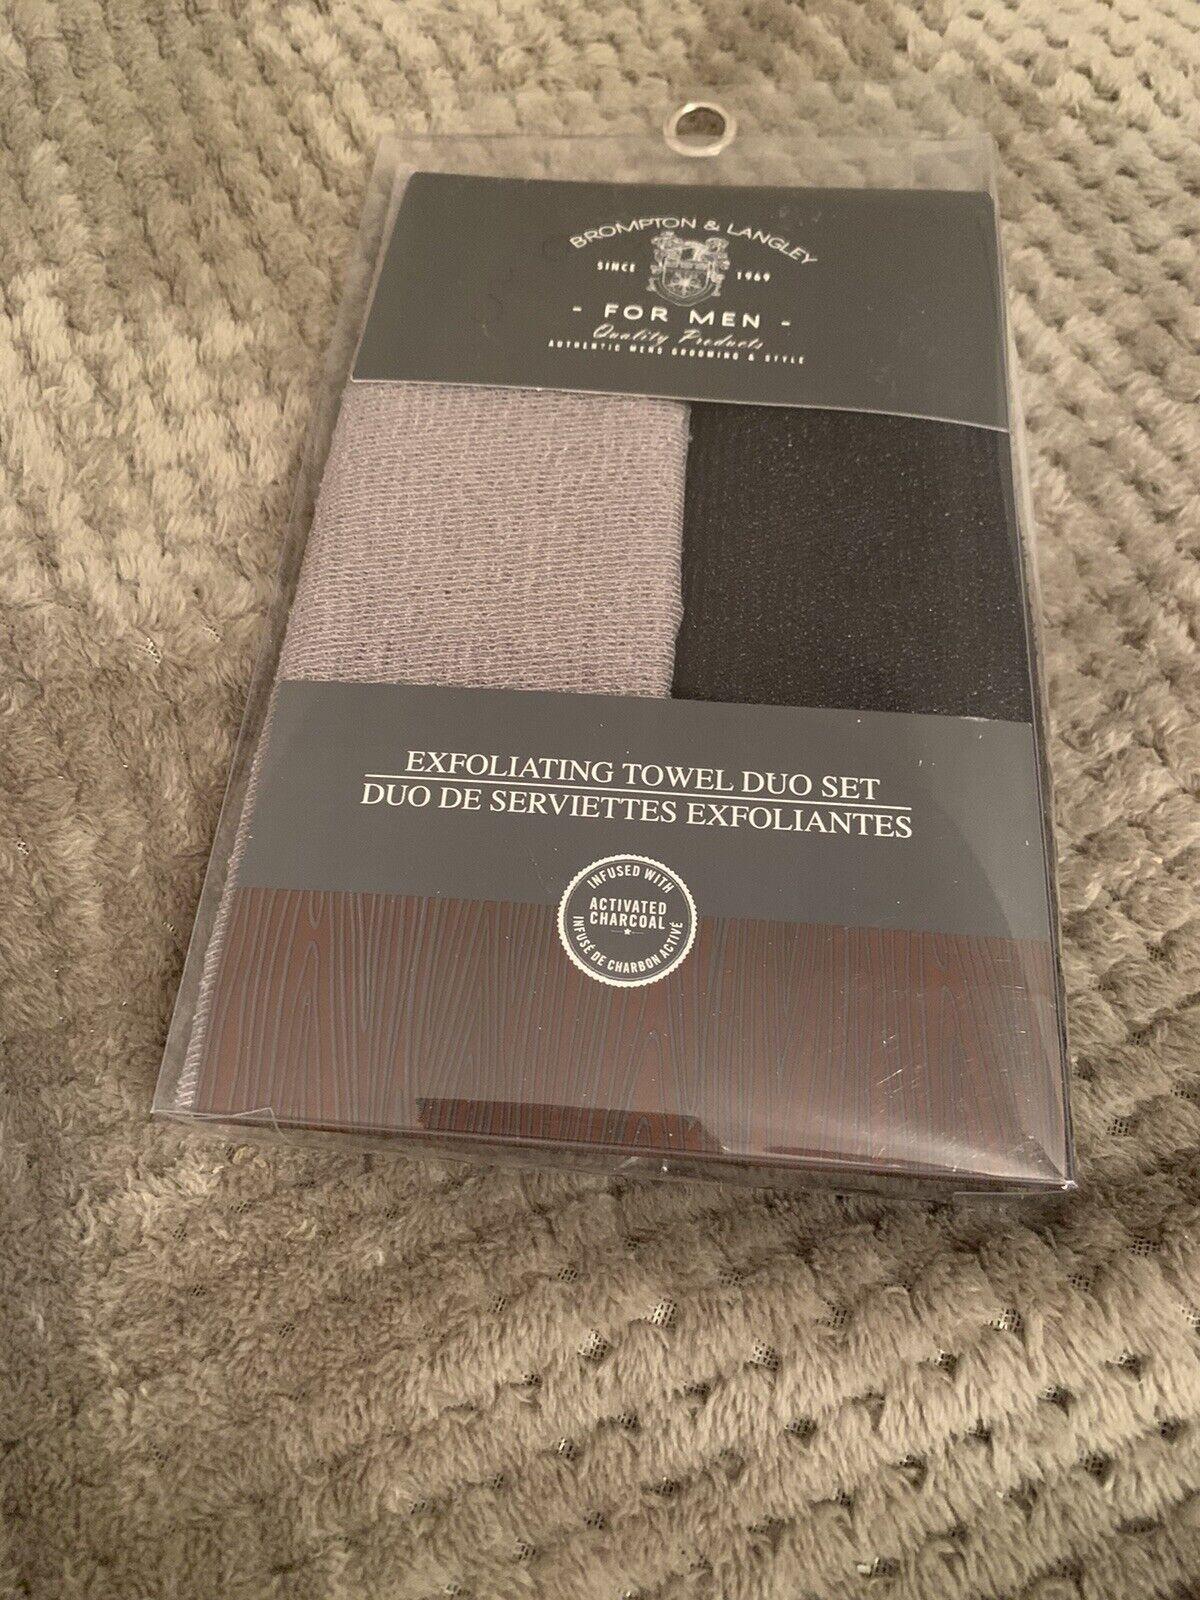 Brompton & Langley Exfoliating Towel Duo Set For Men